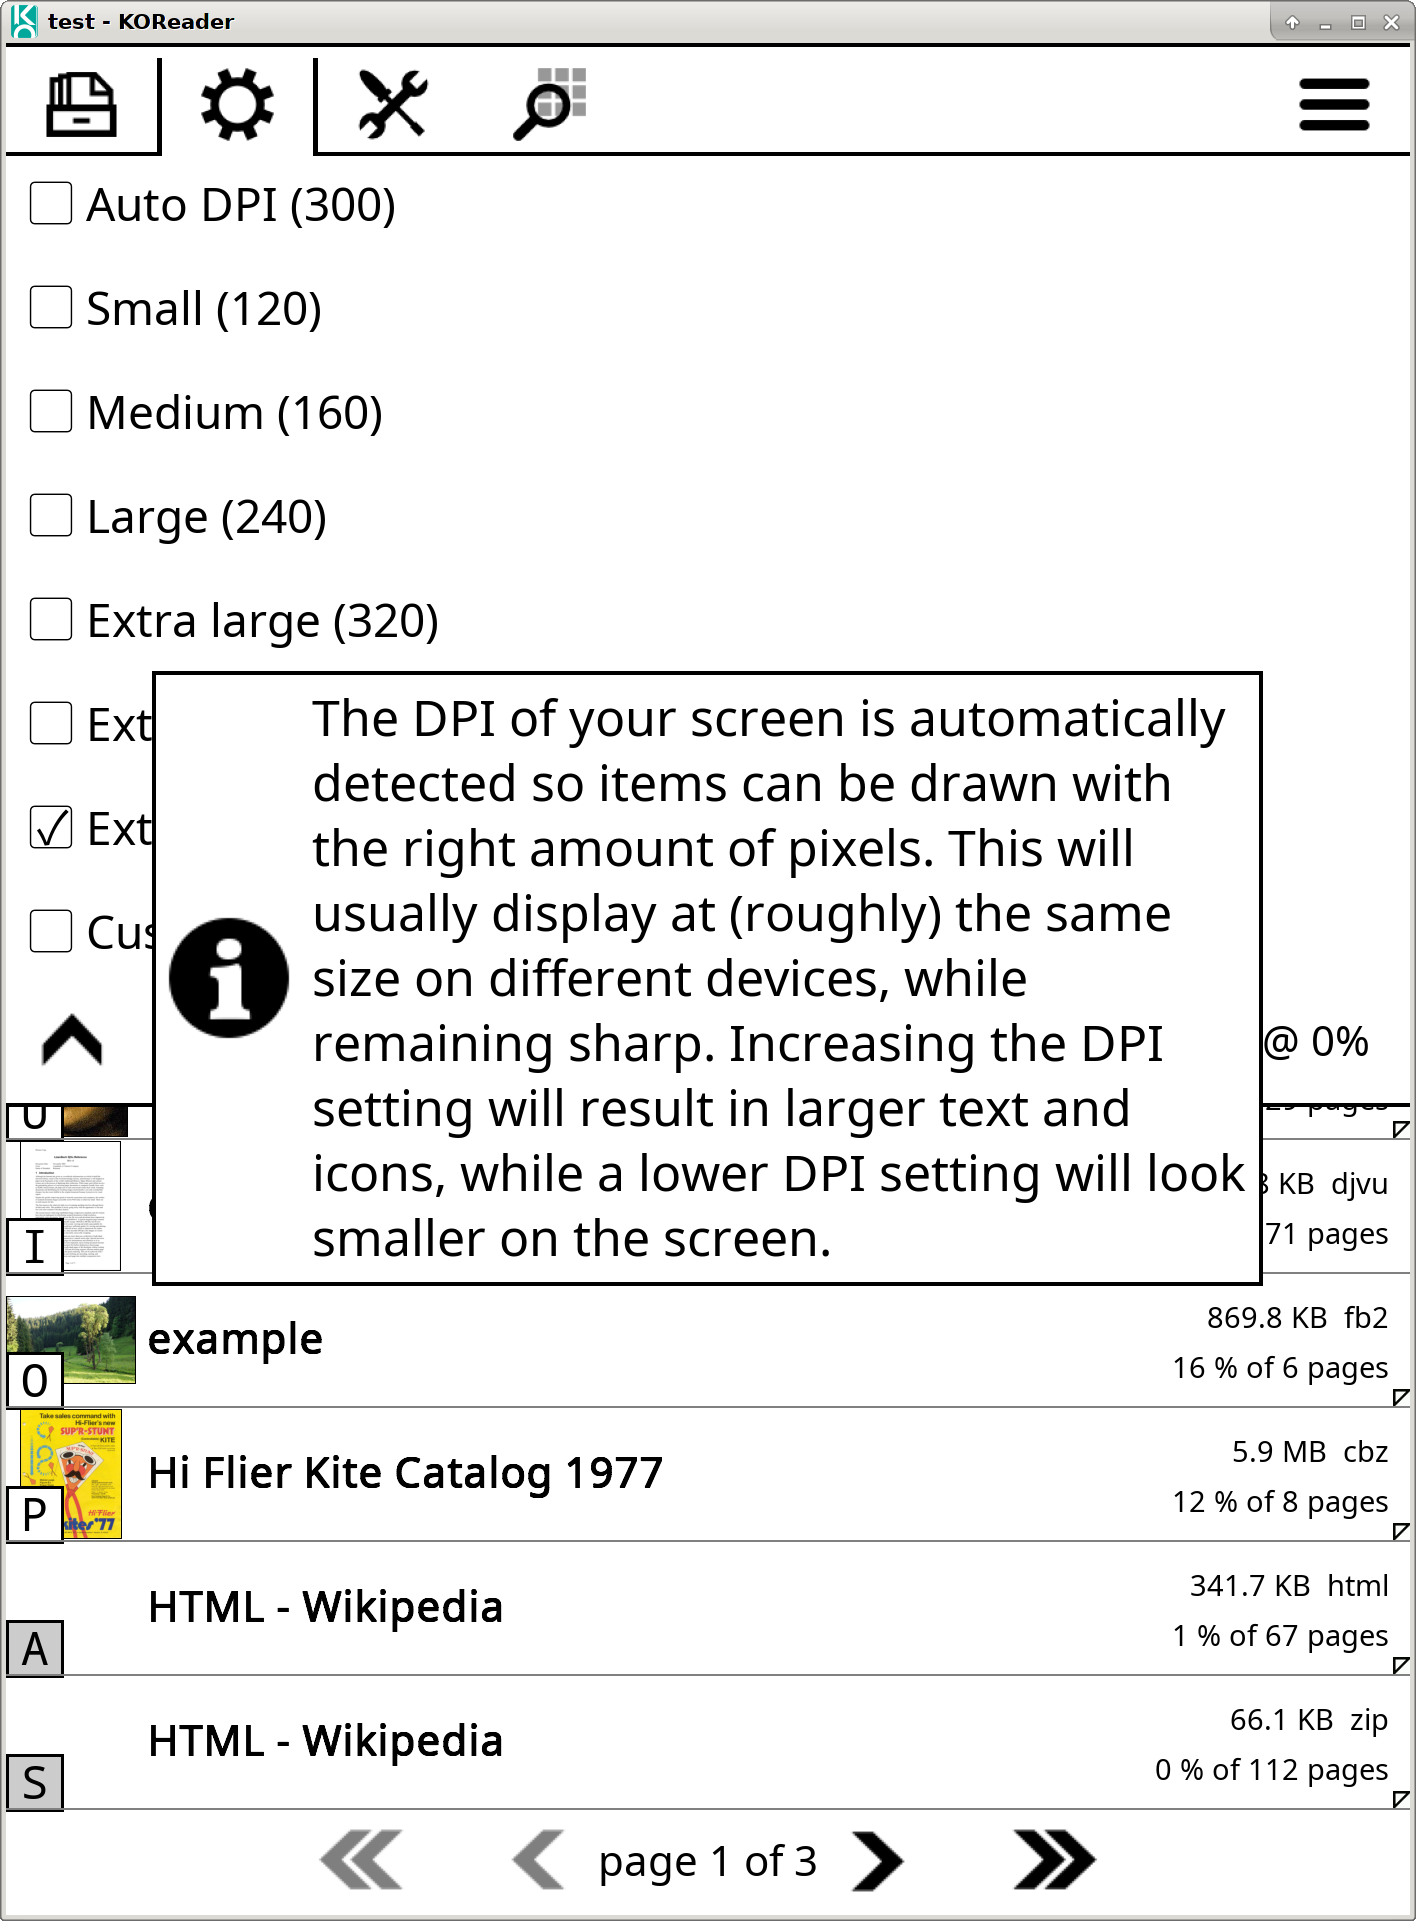 screenshot_2018-12-08_21-15-49